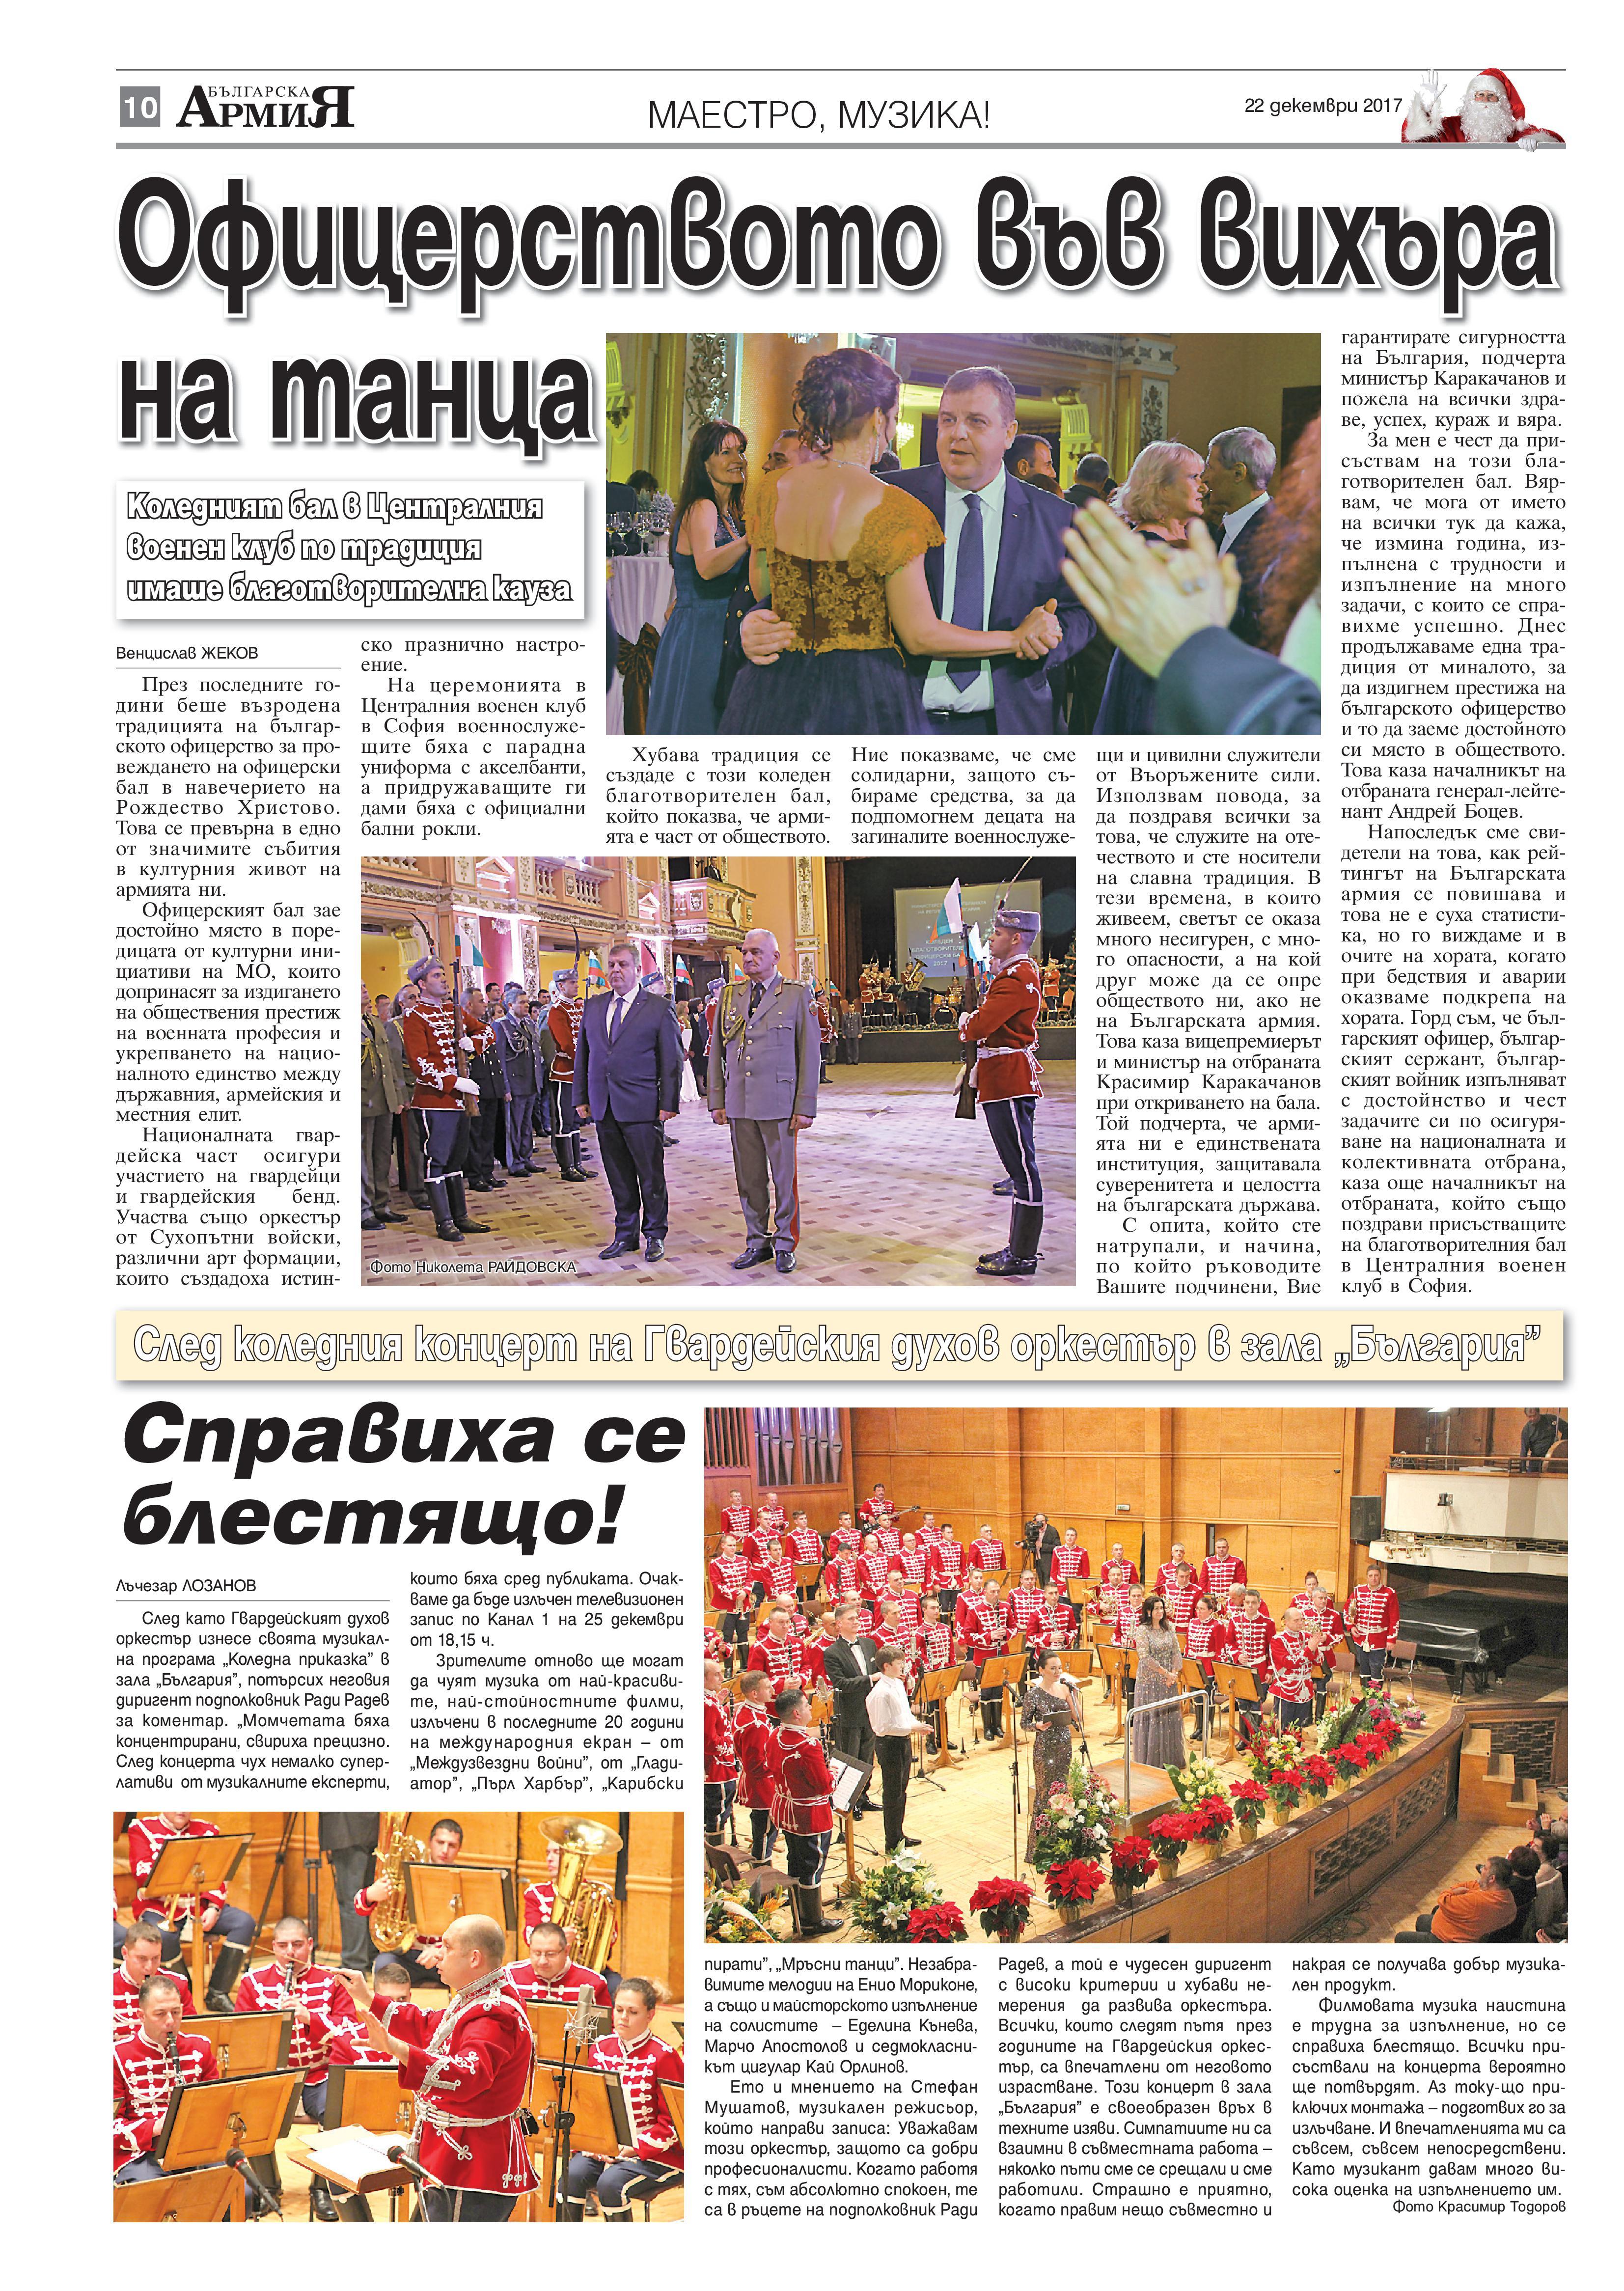 http://armymedia.bg/wp-content/uploads/2015/06/10-16.jpg